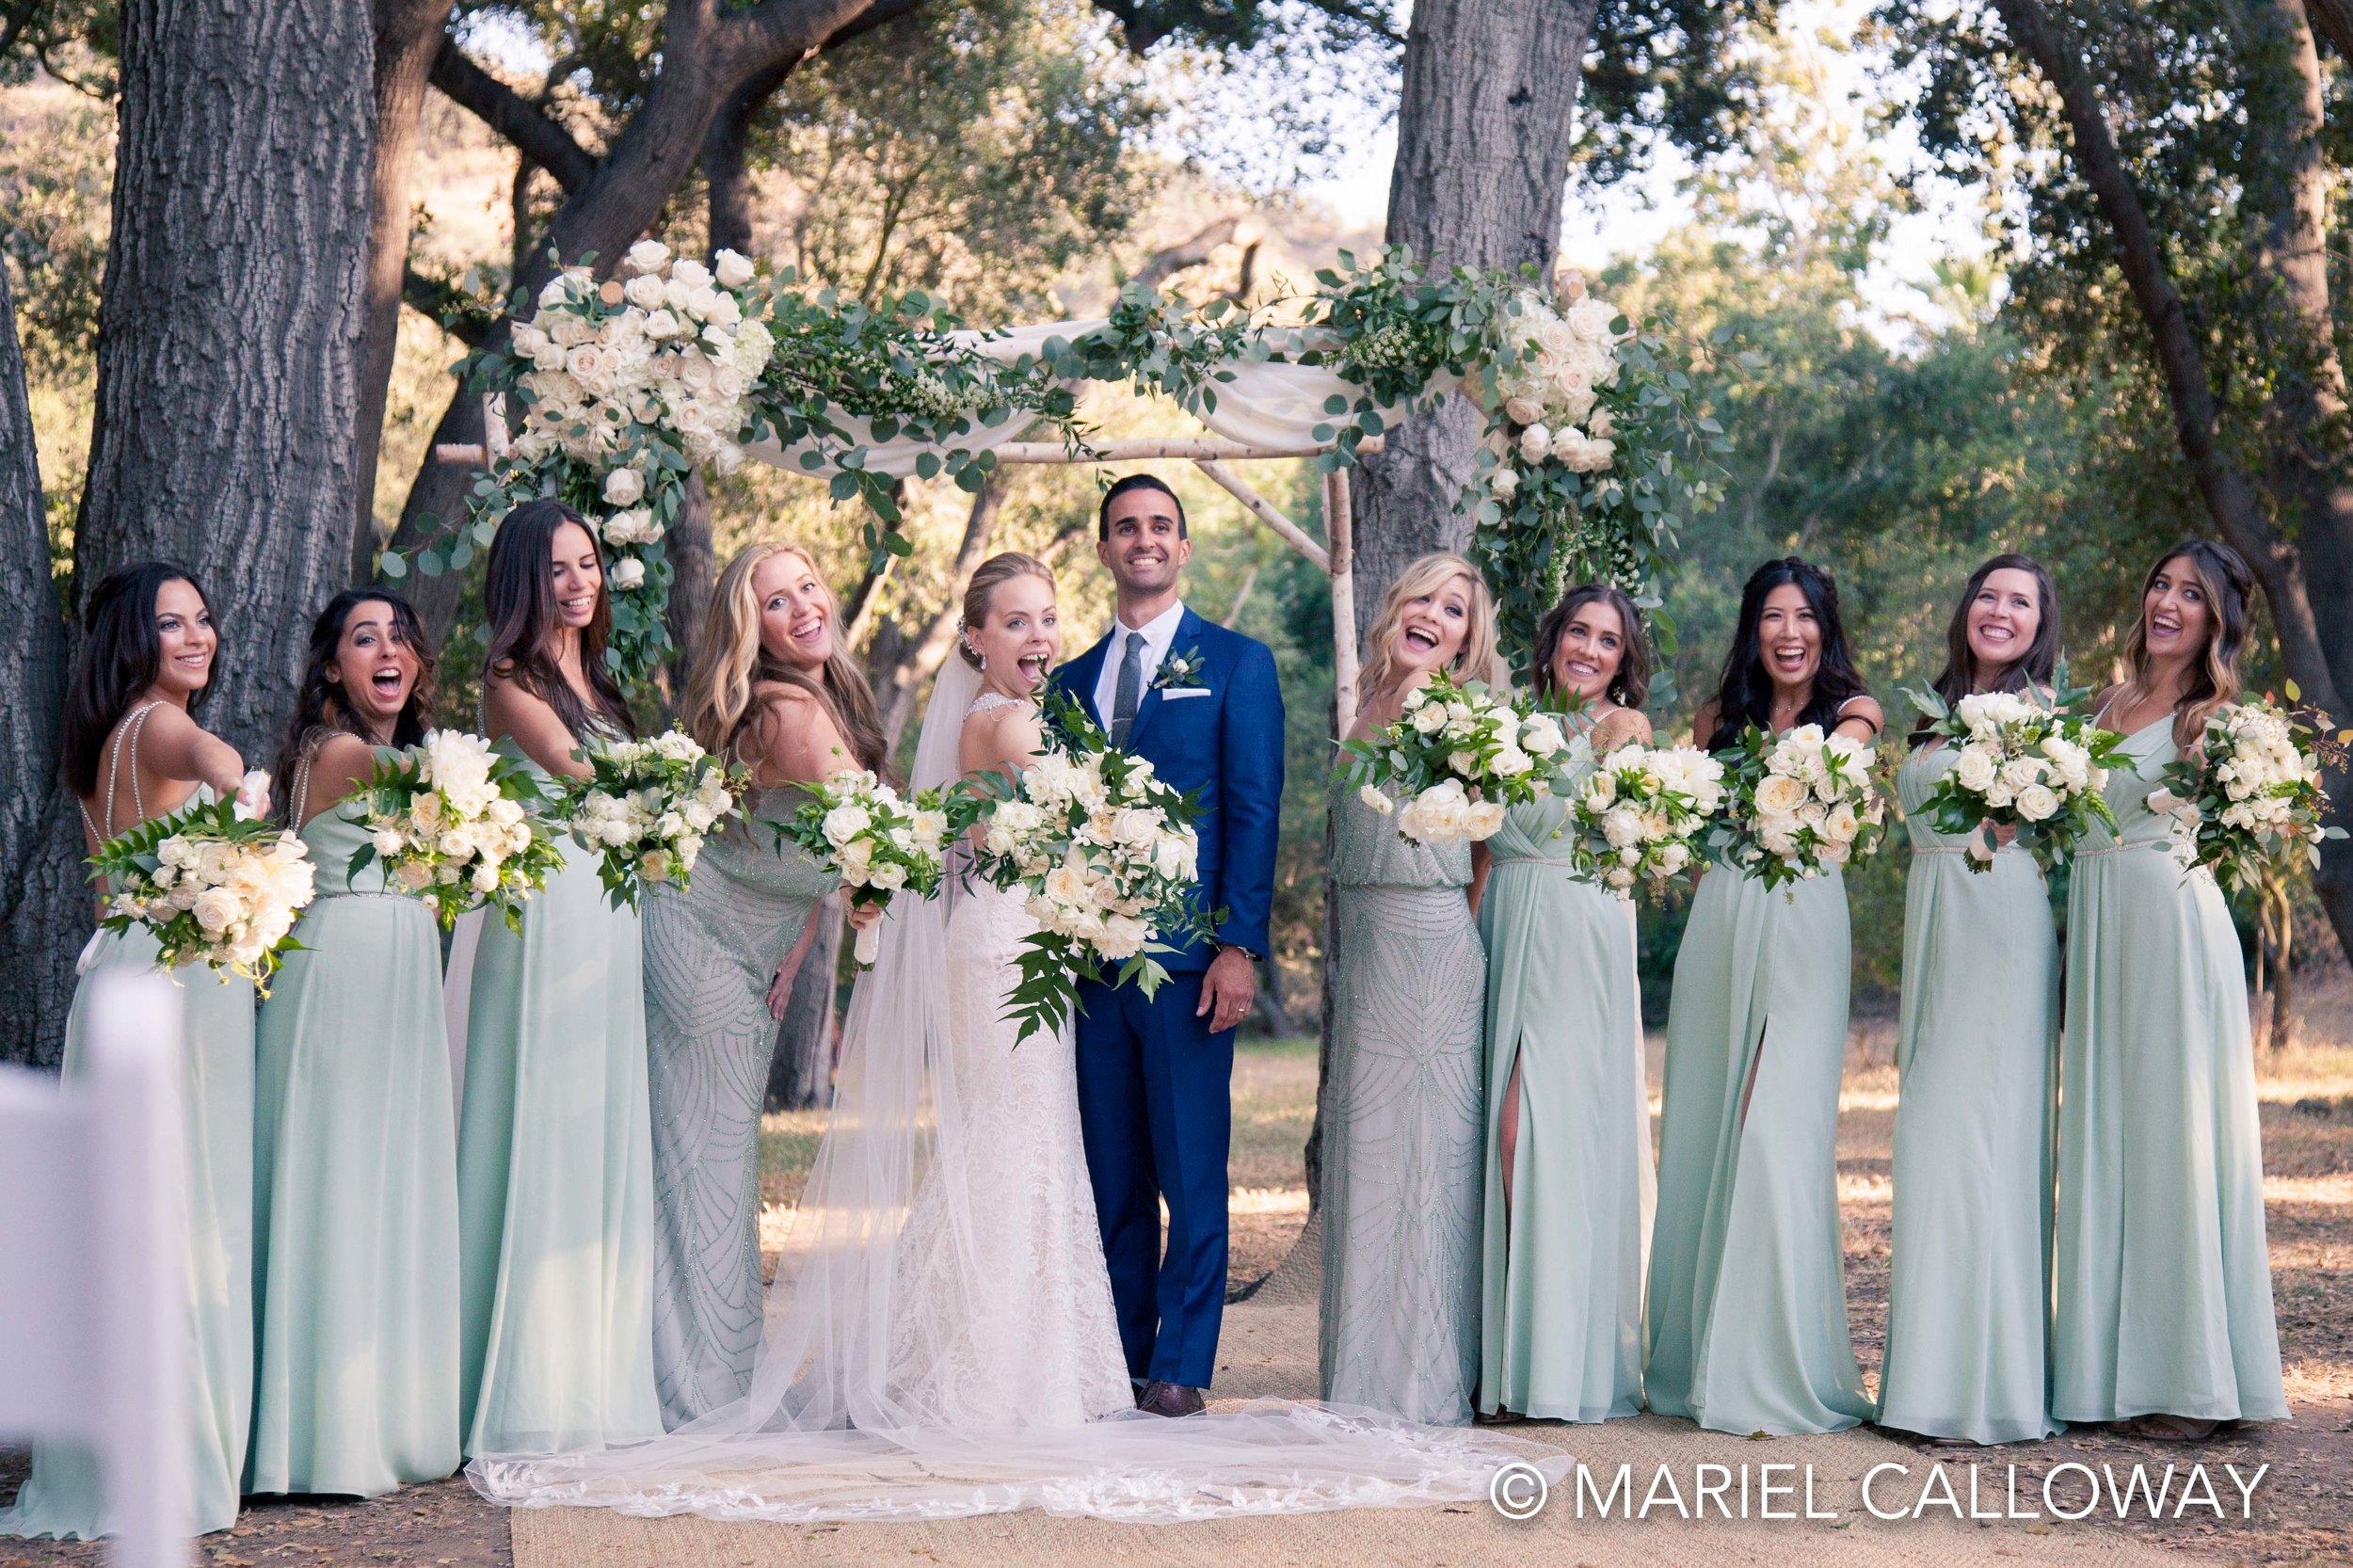 Mariel-Calloway-Los-Angeles-Wedding-Photography-Smith-29.jpg